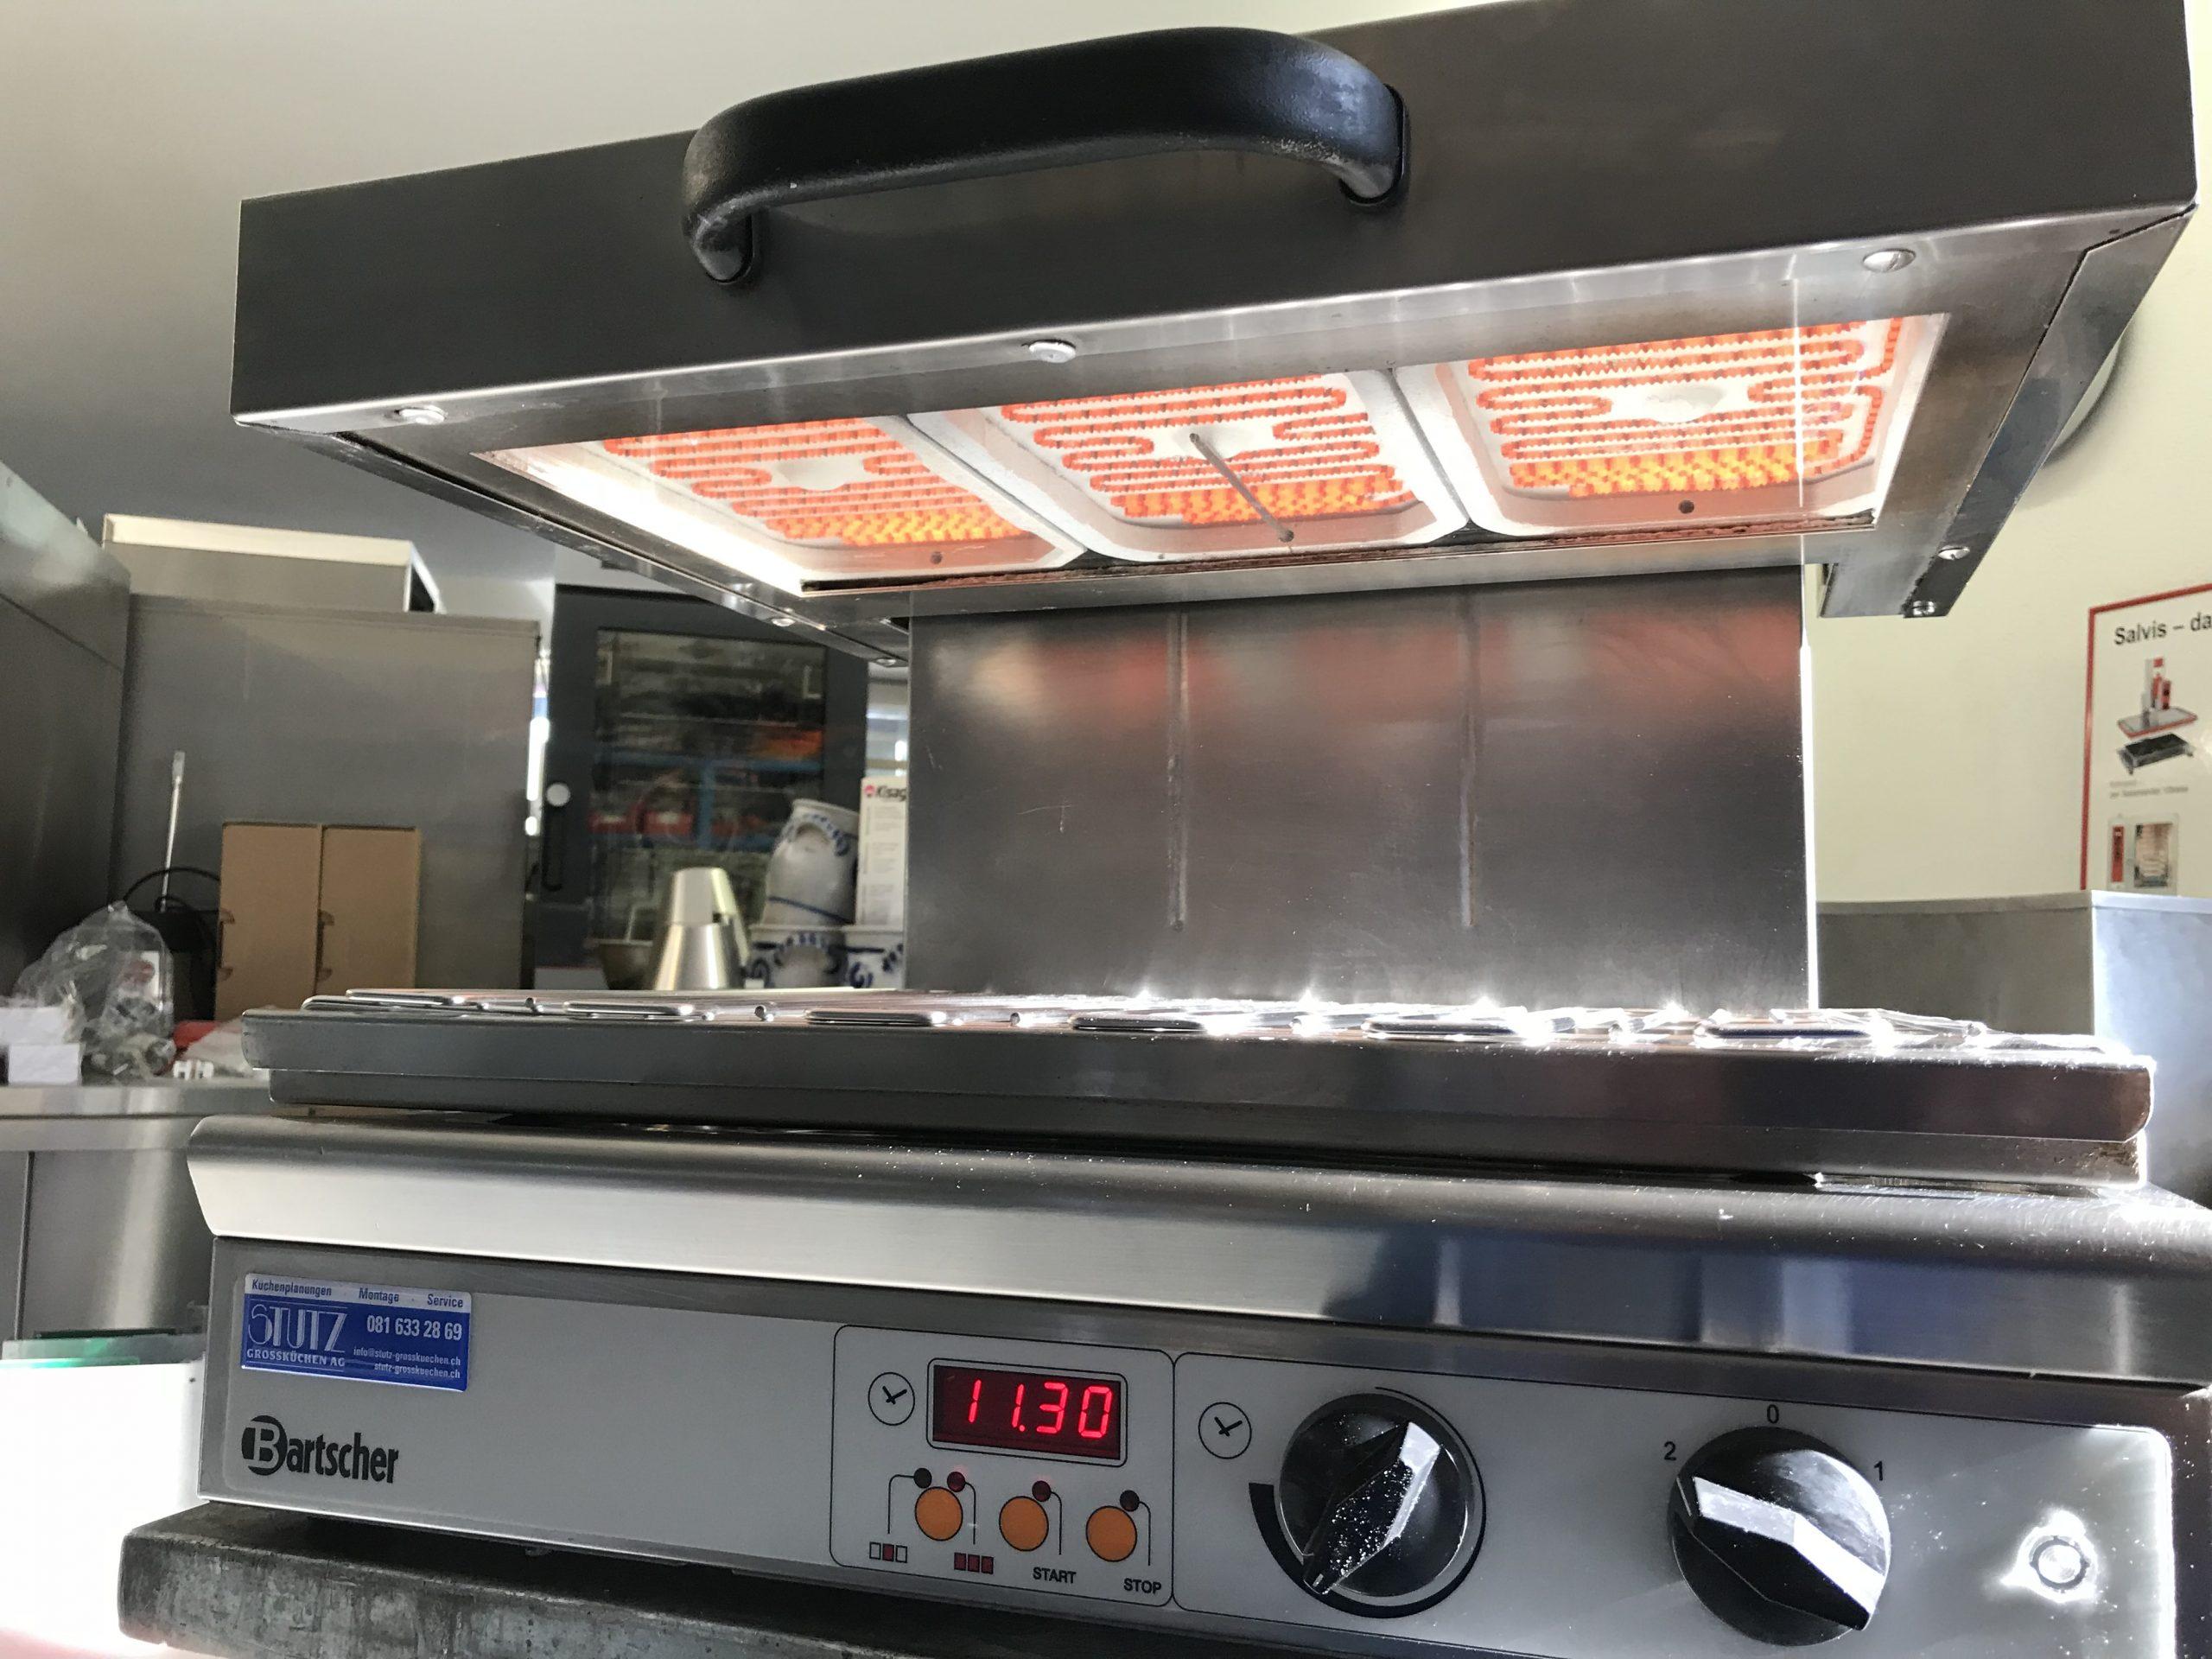 Full Size of Salamander Küche Salamander Küche Gebraucht Salamander Küche Amazon Salamander Küche Bartscher Küche Salamander Küche